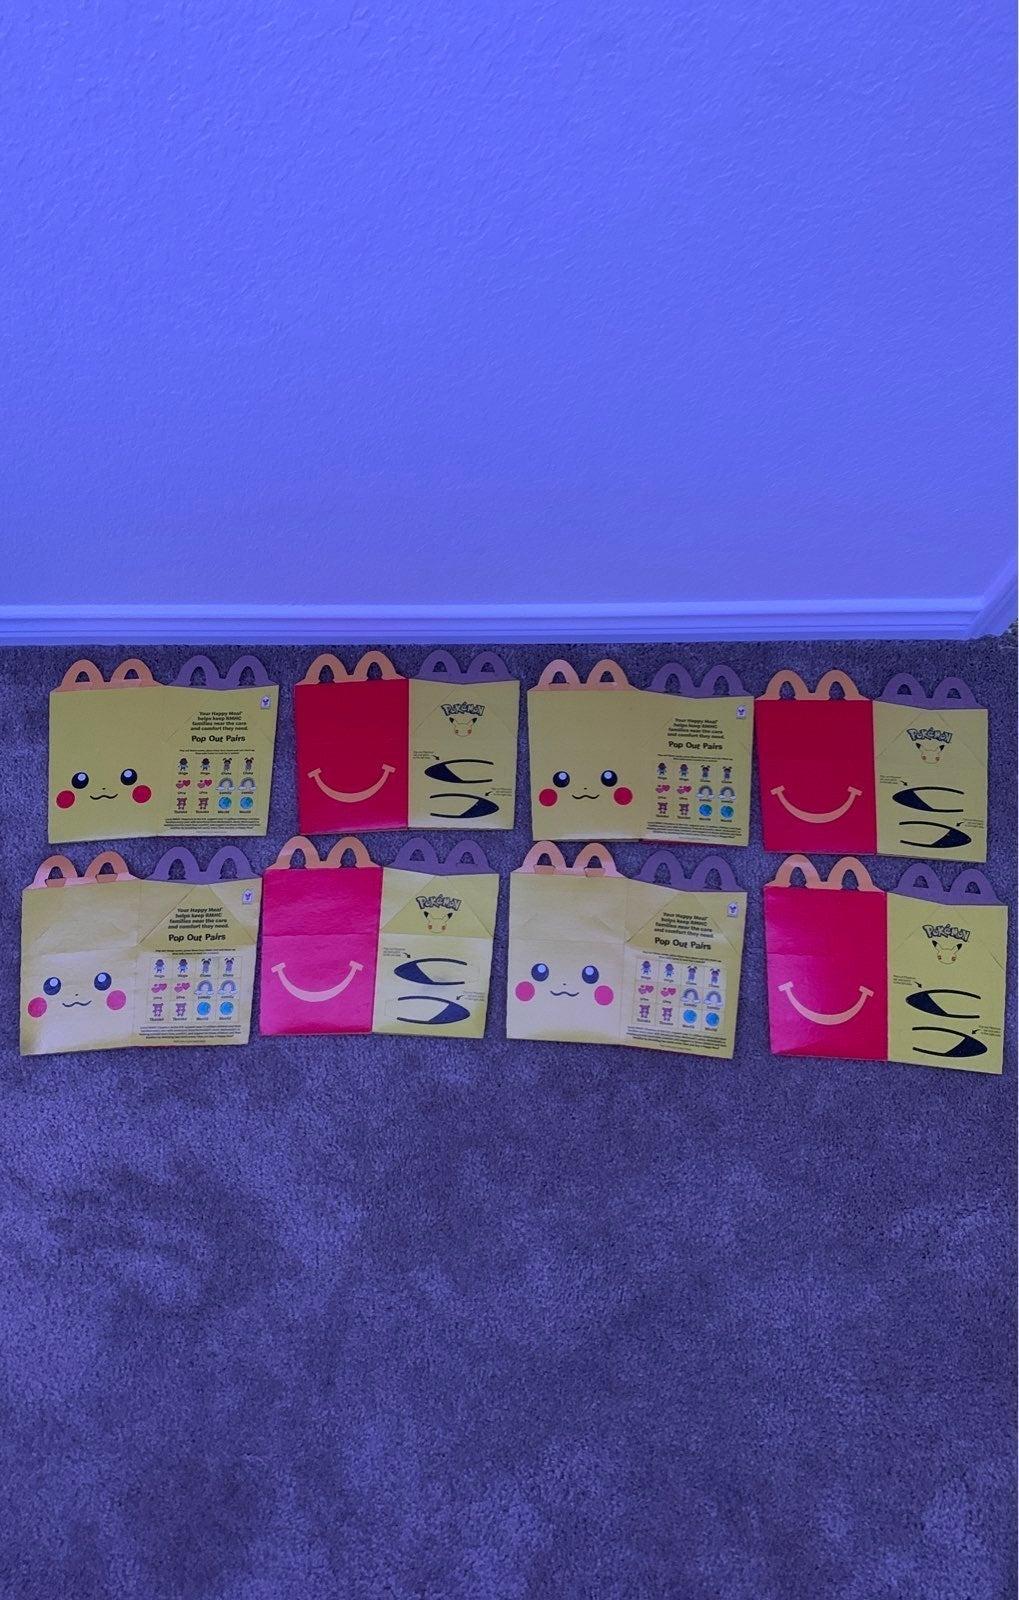 McDonald's Pikachu Box